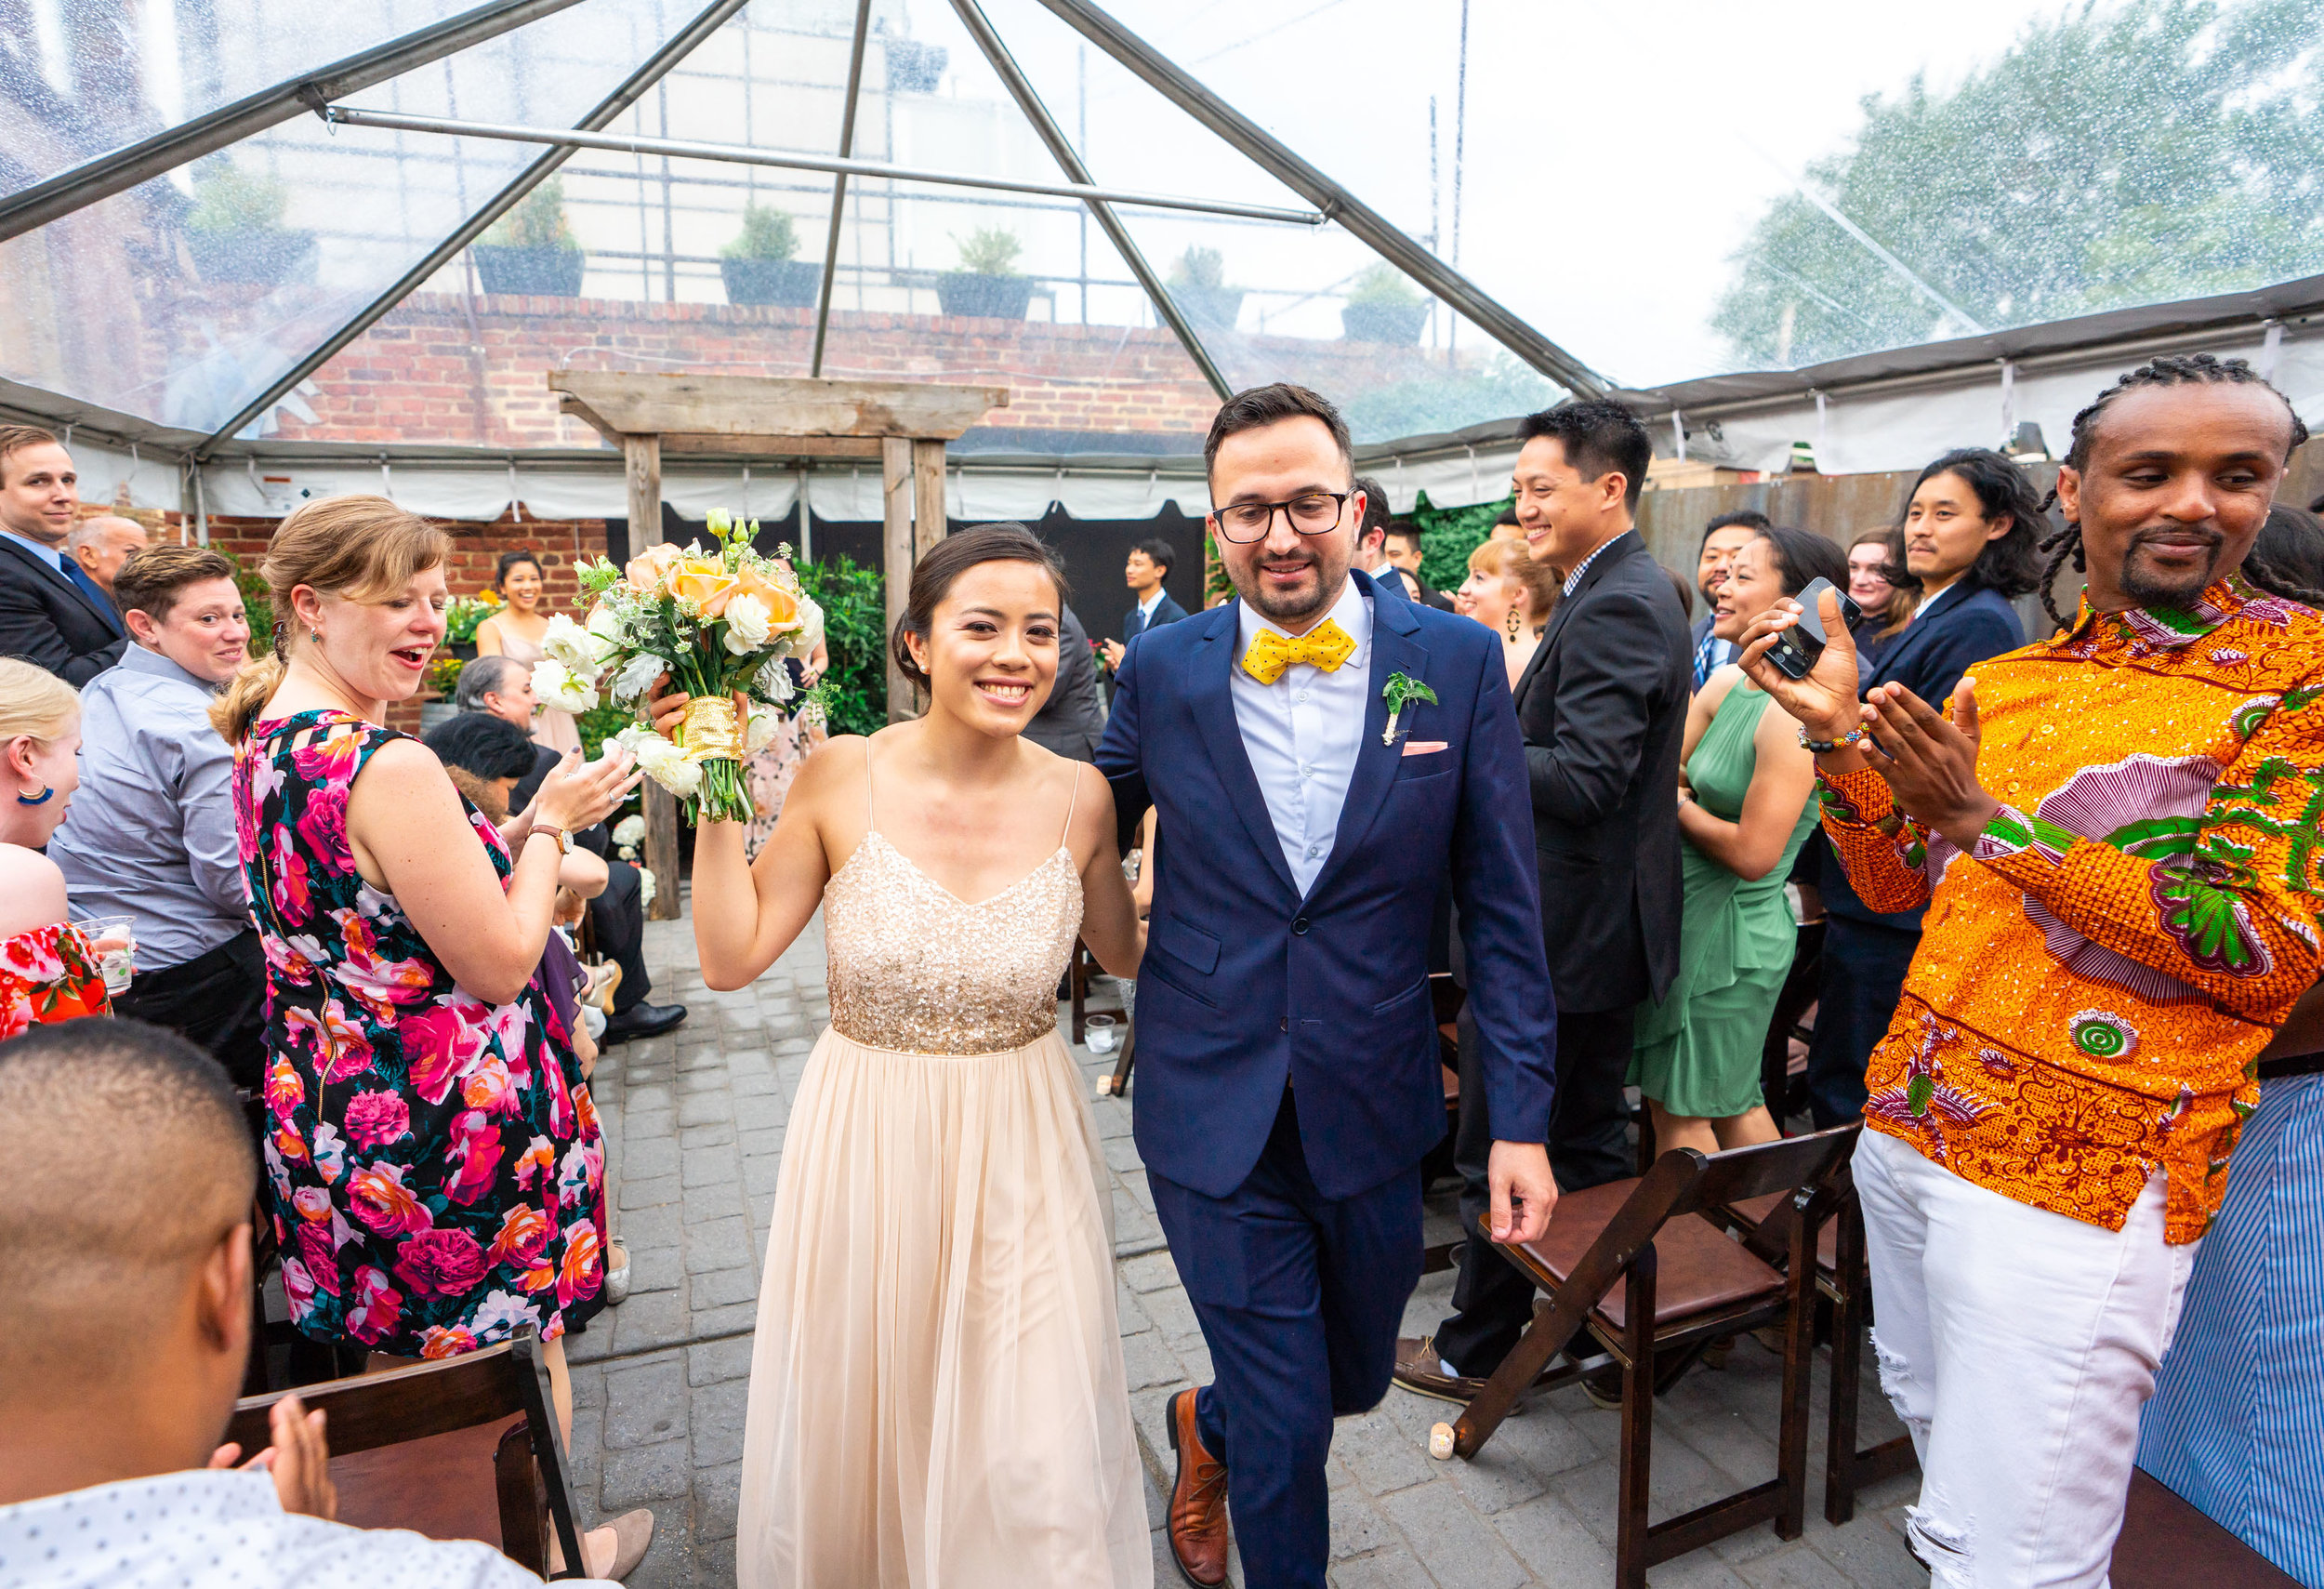 Wedding ceremony at urban venue Gallery OonH in DC by Jessica Nazarova